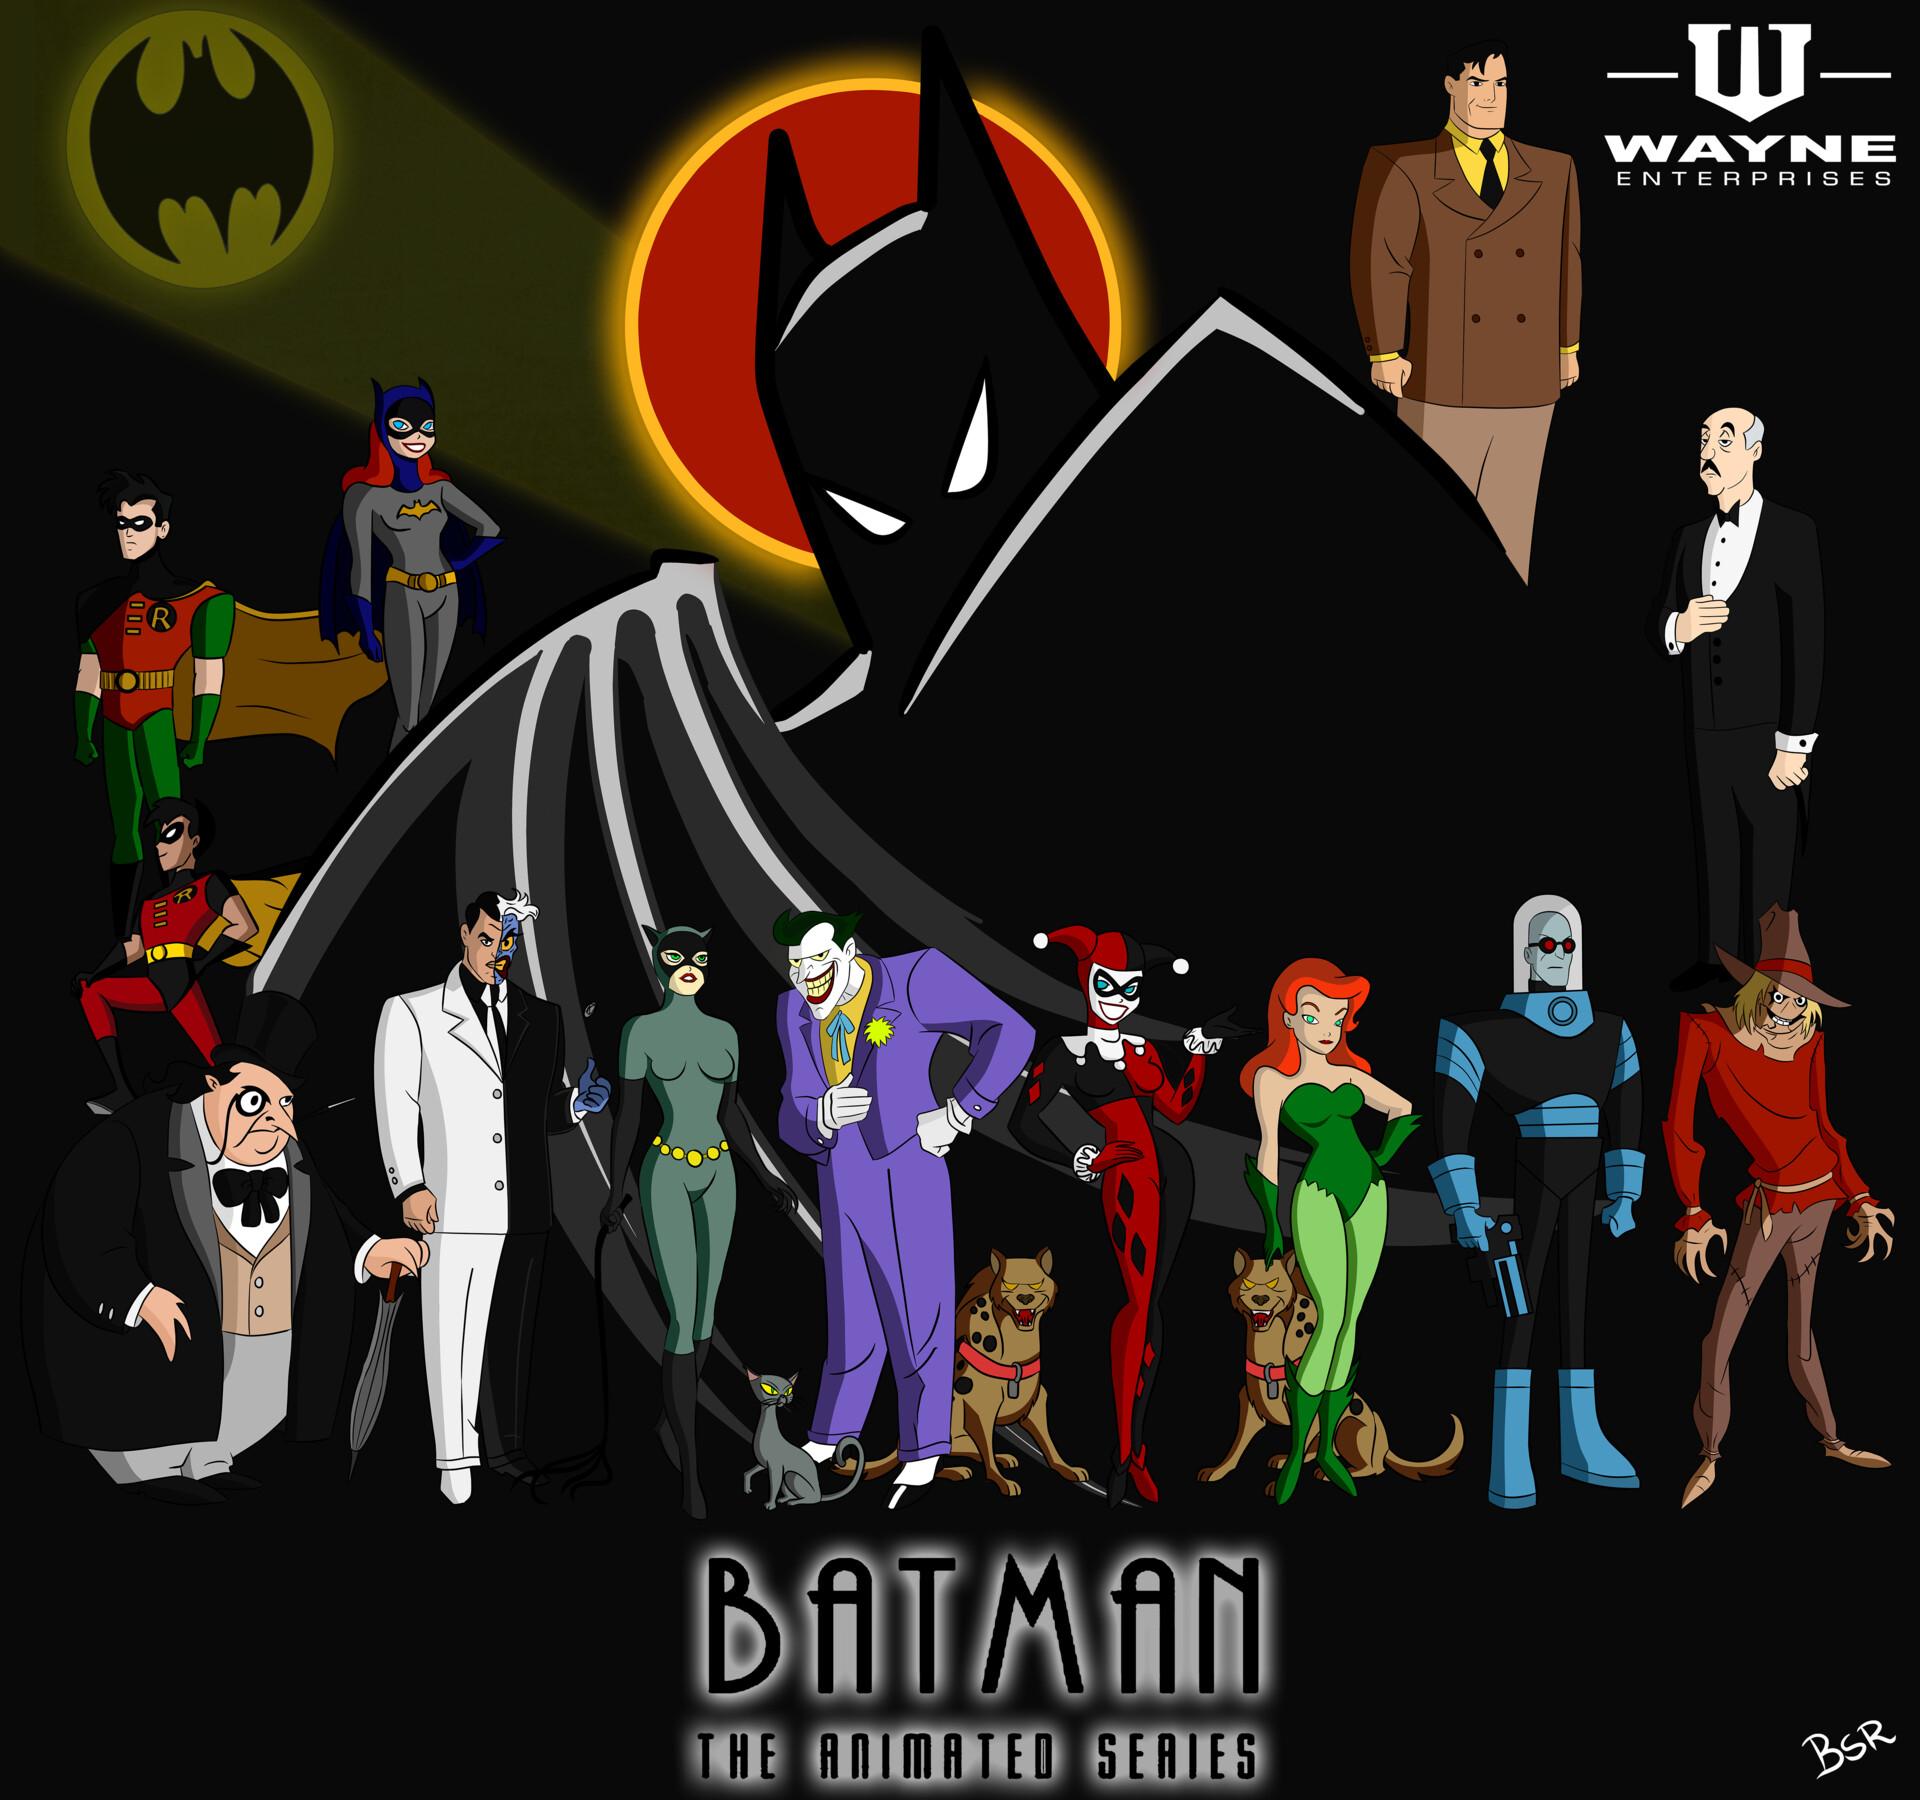 animated series poster bhargav s rajan